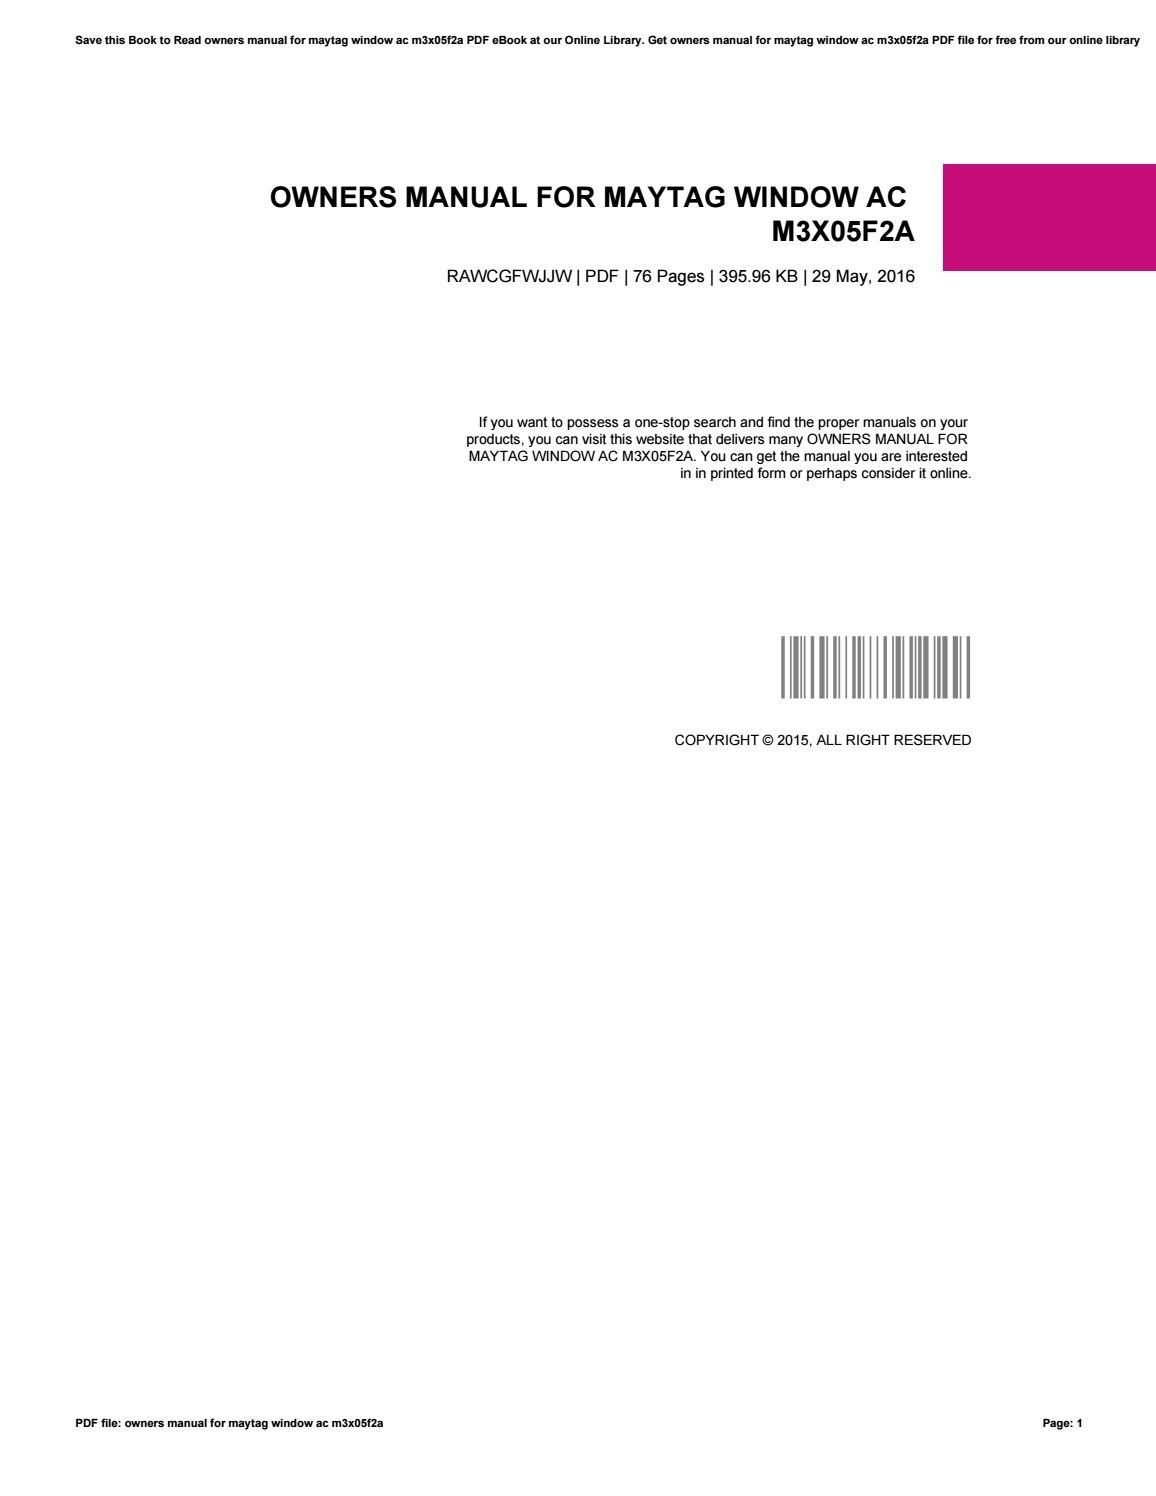 owners manual for maytag window ac m3x05f2a by giselecorrigan4600 rh issuu com User Manual User Manual